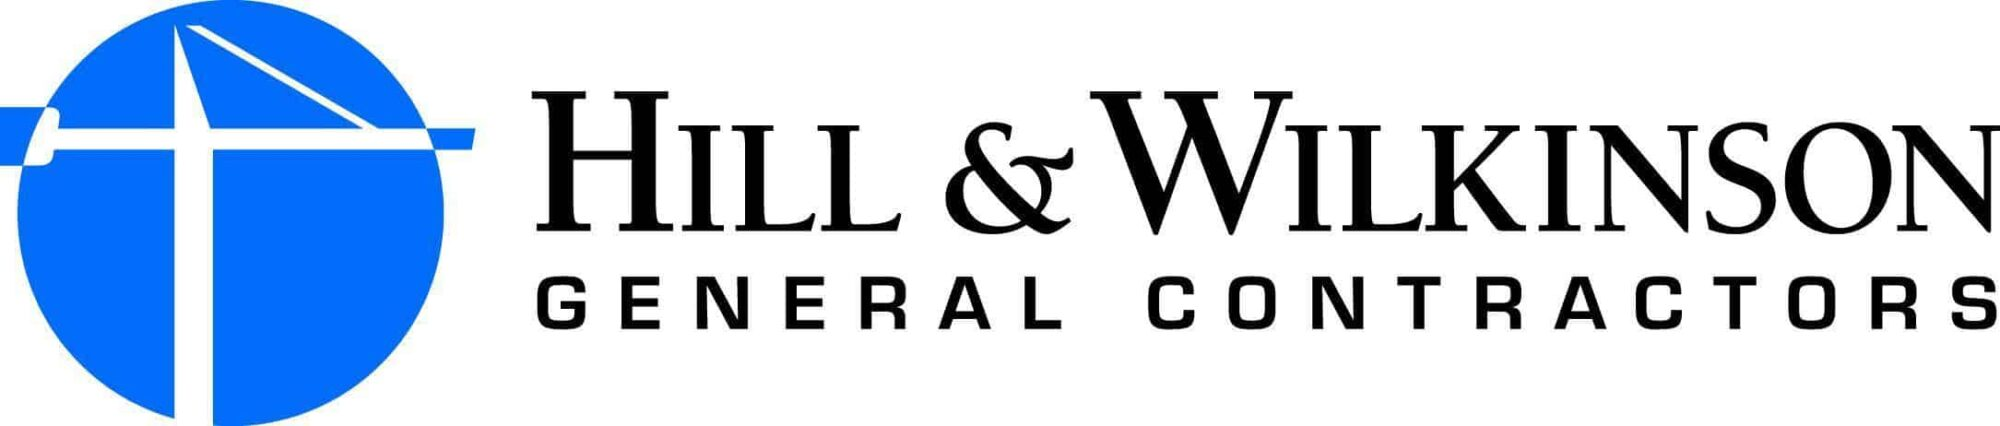 Hill & Wilkerson General Contractors